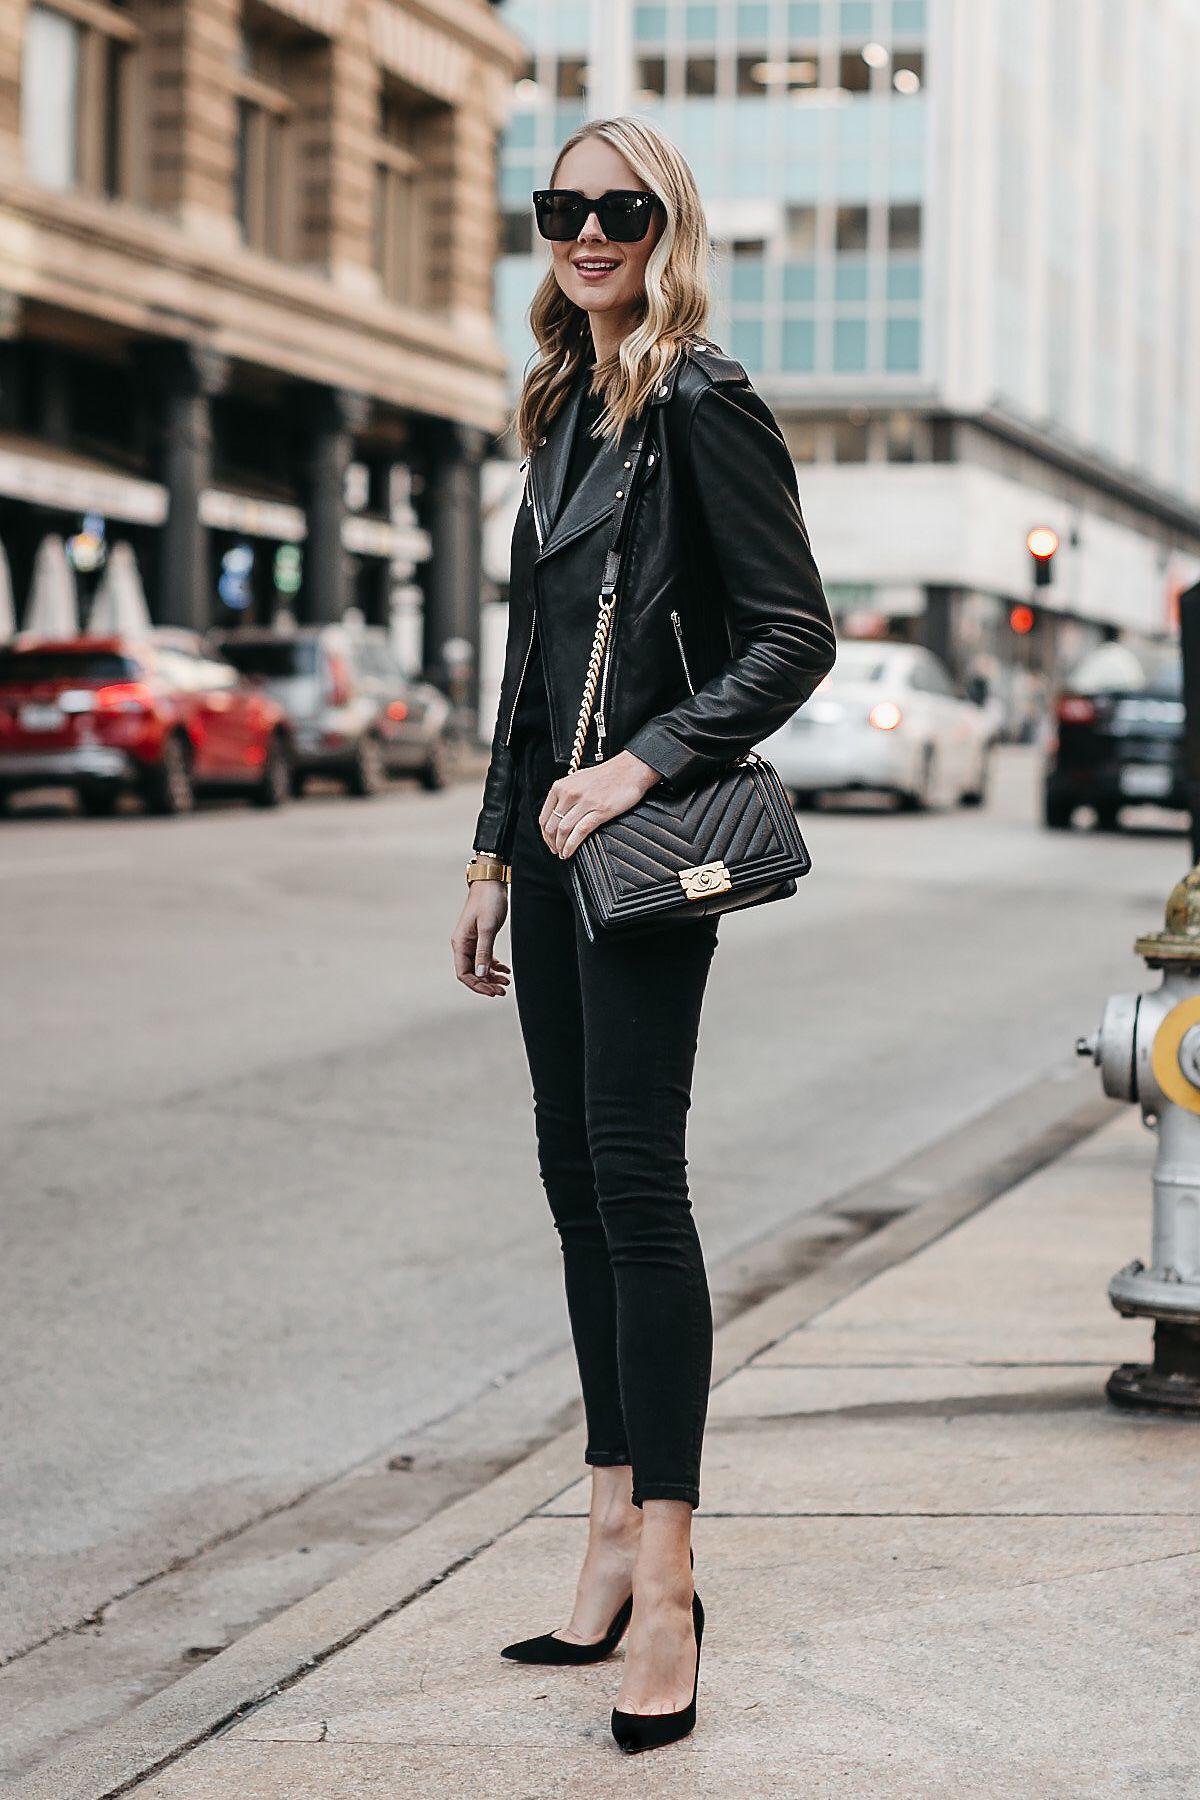 ed9b51e4f673a4 Blonde Woman Wearing Club Monaco Black Leather Jacket Black Sweater Black  Skinny Jeans Black Pumps Chanel Boy Bag Fashion Jackson Dallas Blogger  Fashion ...